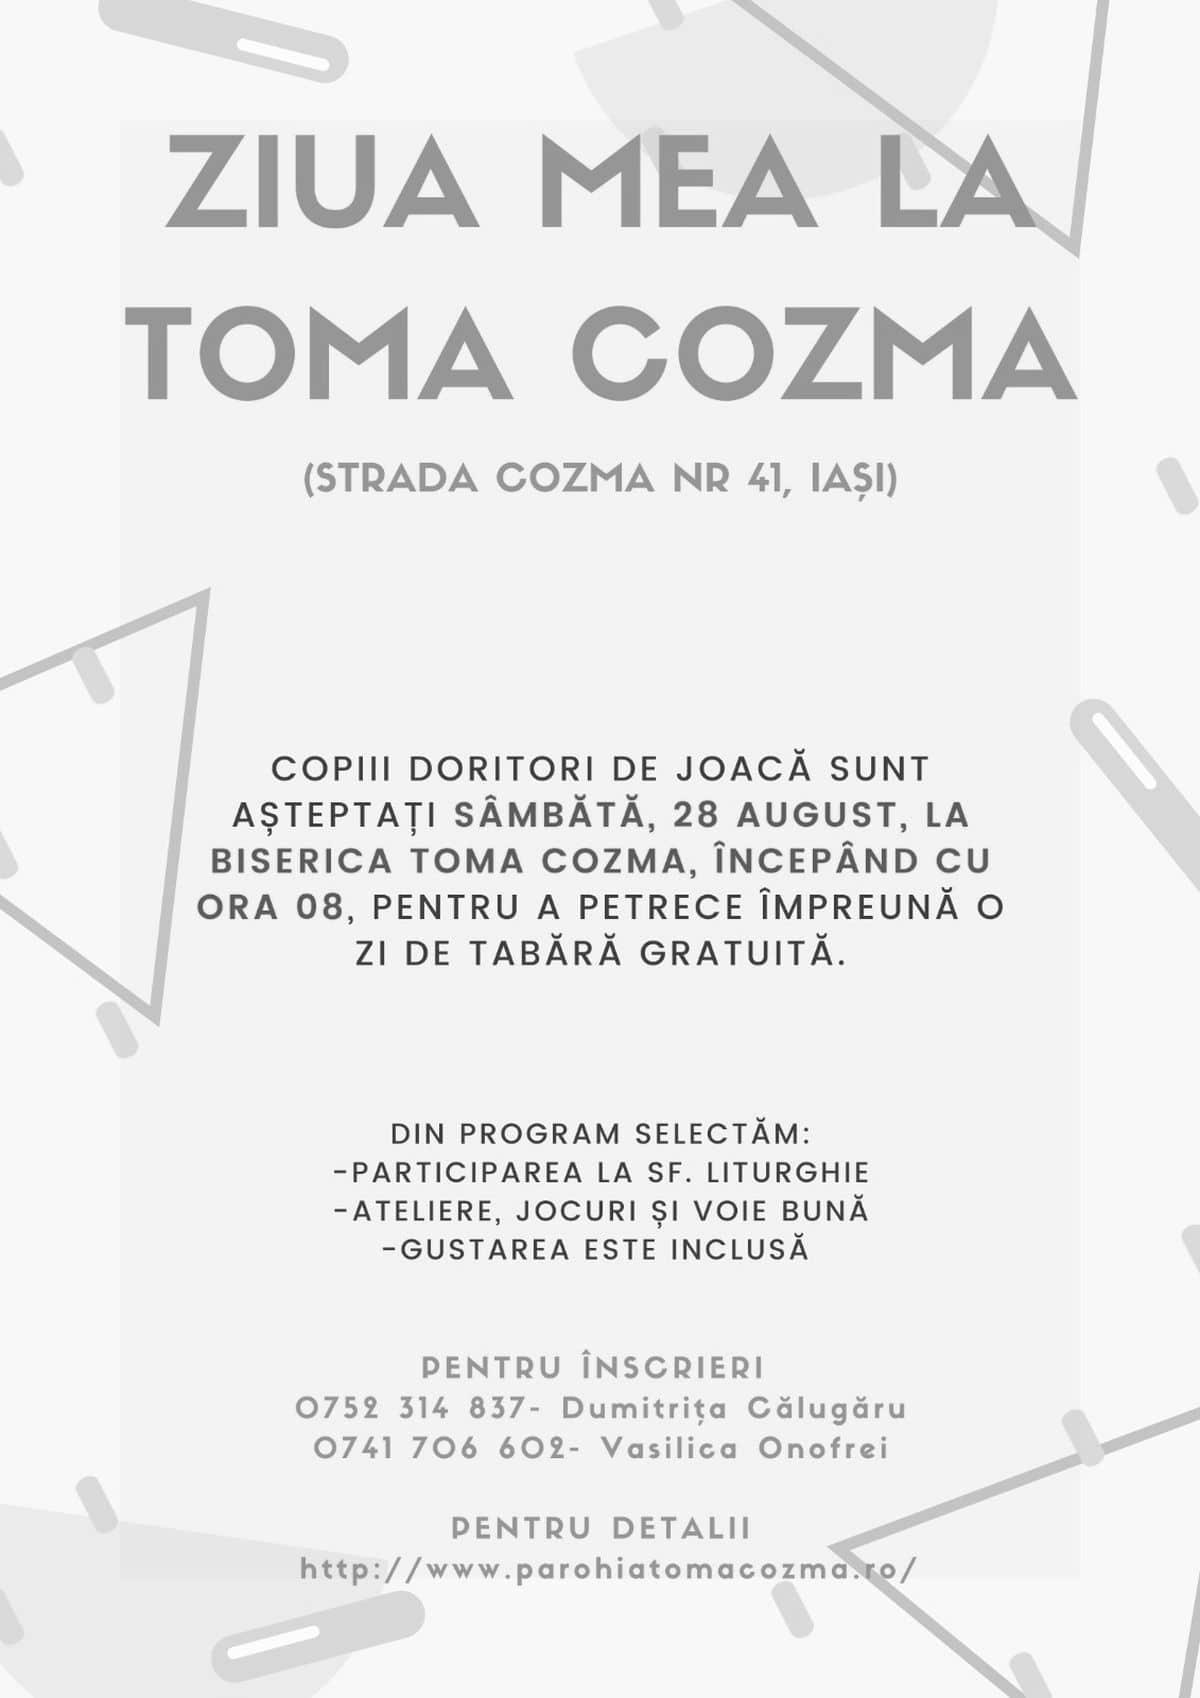 Ziua mea la Toma Cozma